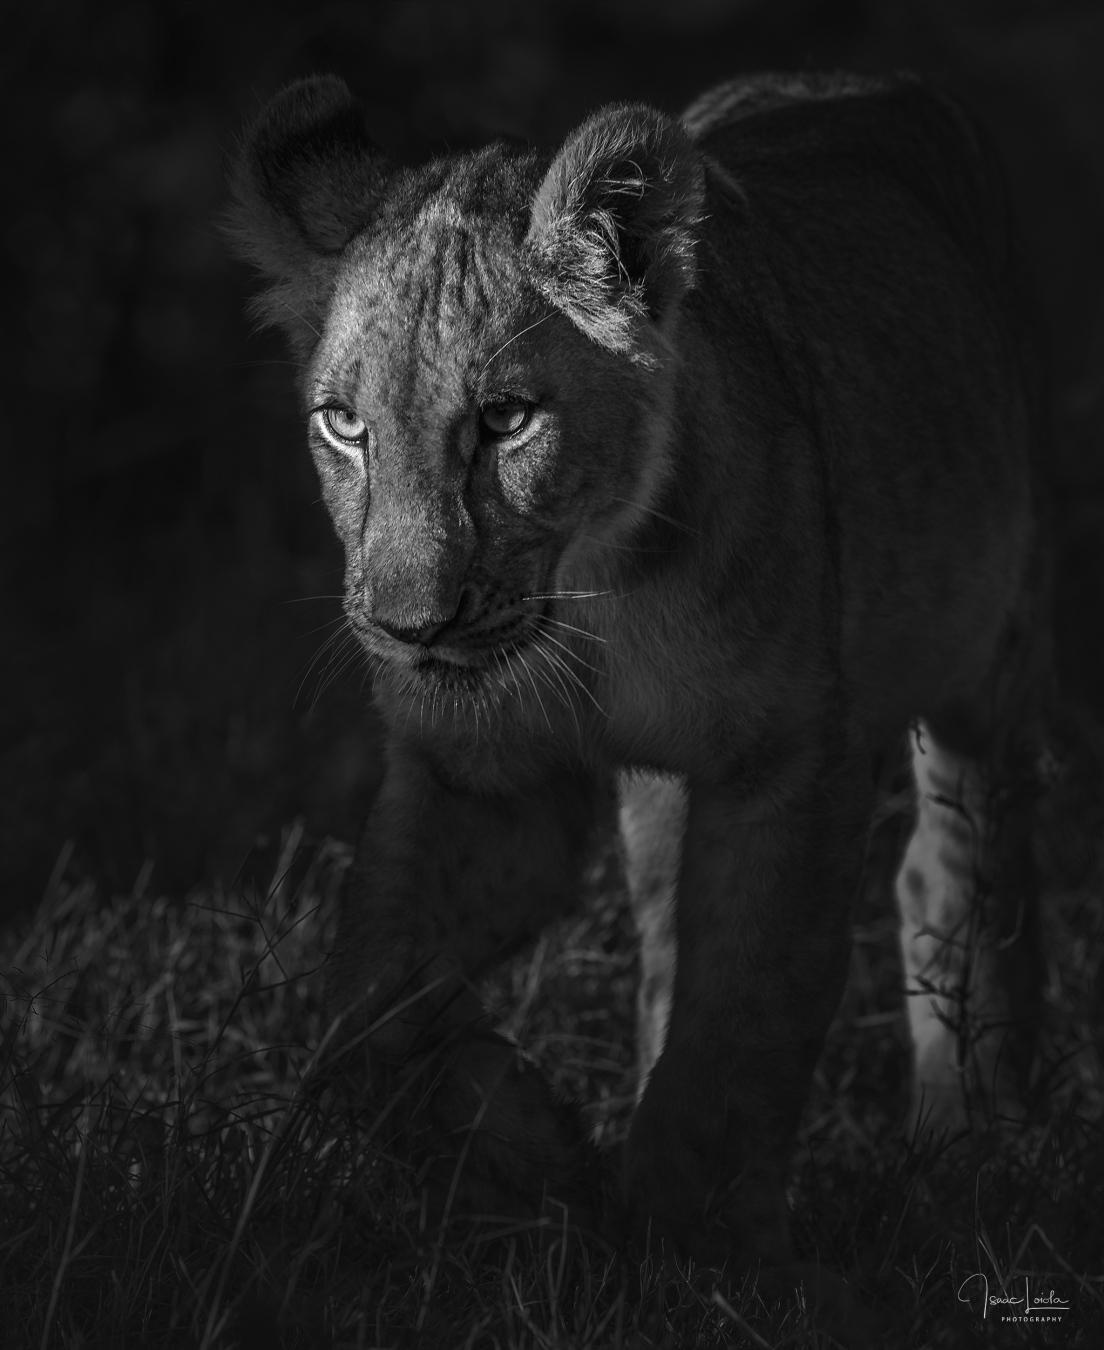 Leones - Isaac Loiola, Photography